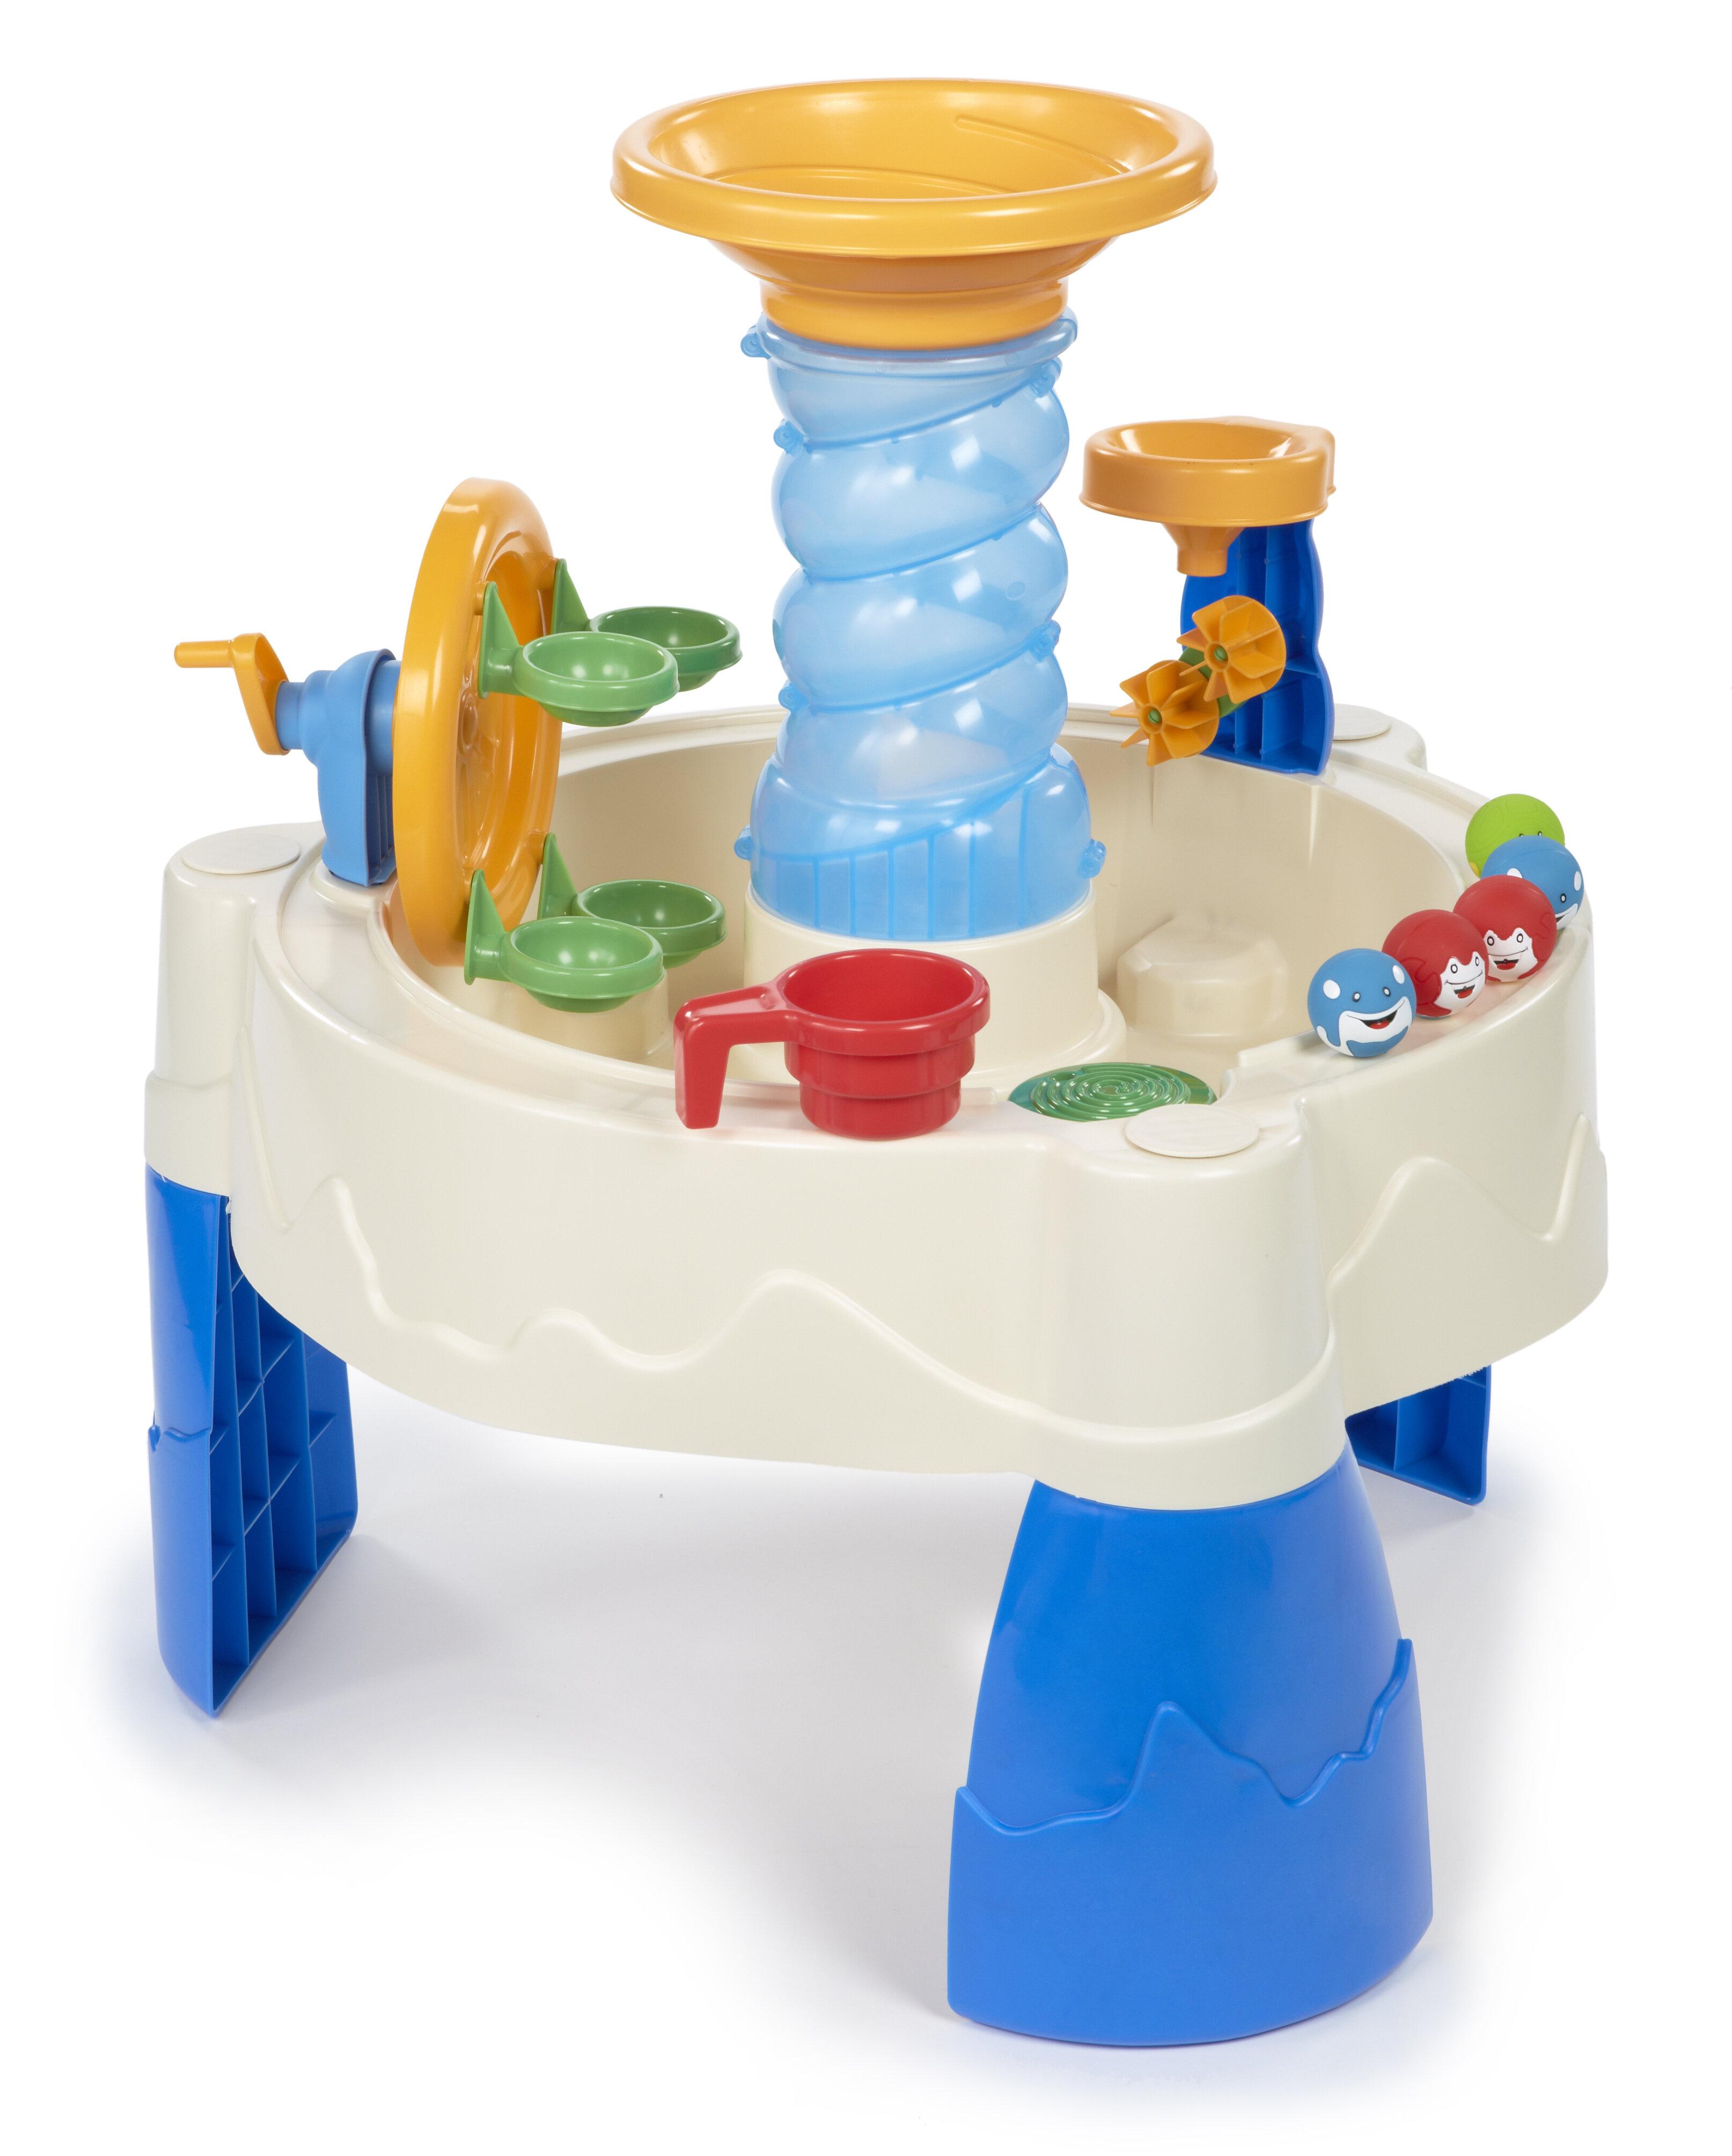 Spiralin Seas Sand Water Table